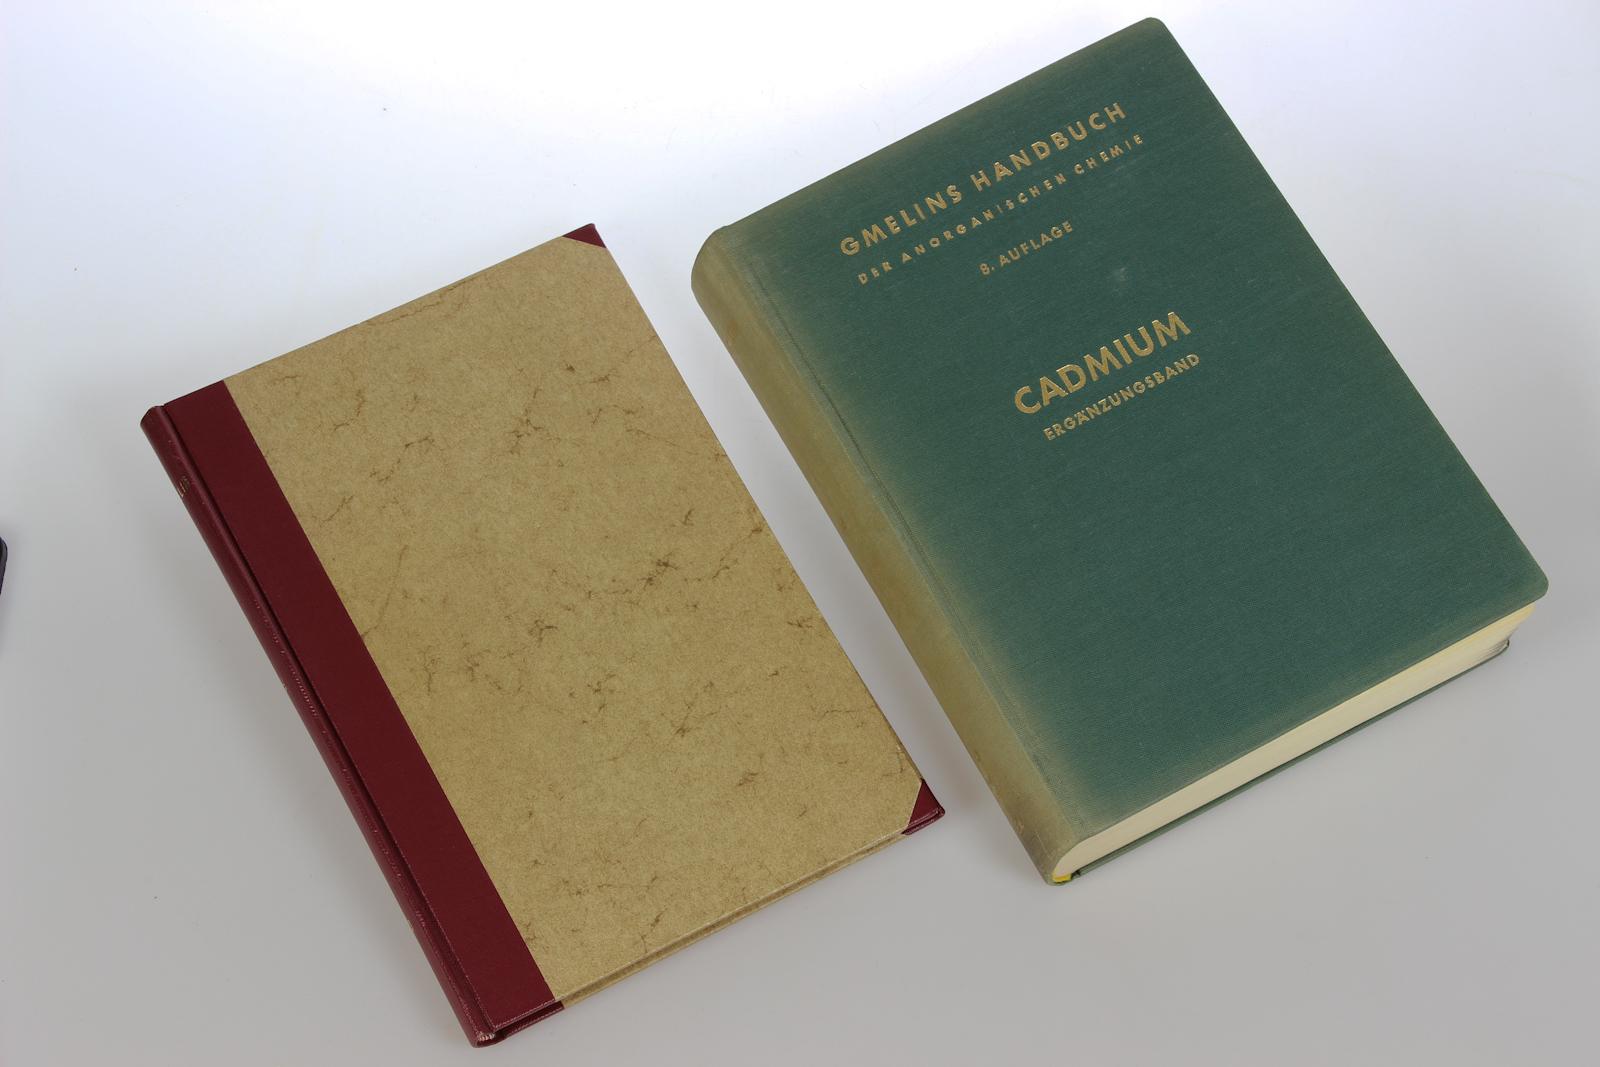 Gmelin Handbuch der Anorganischen Chemie. System Nummer 33: Cadmium + Ergänzungsband. [2 Bde]. 8. völlig neu bearb. Aufl.